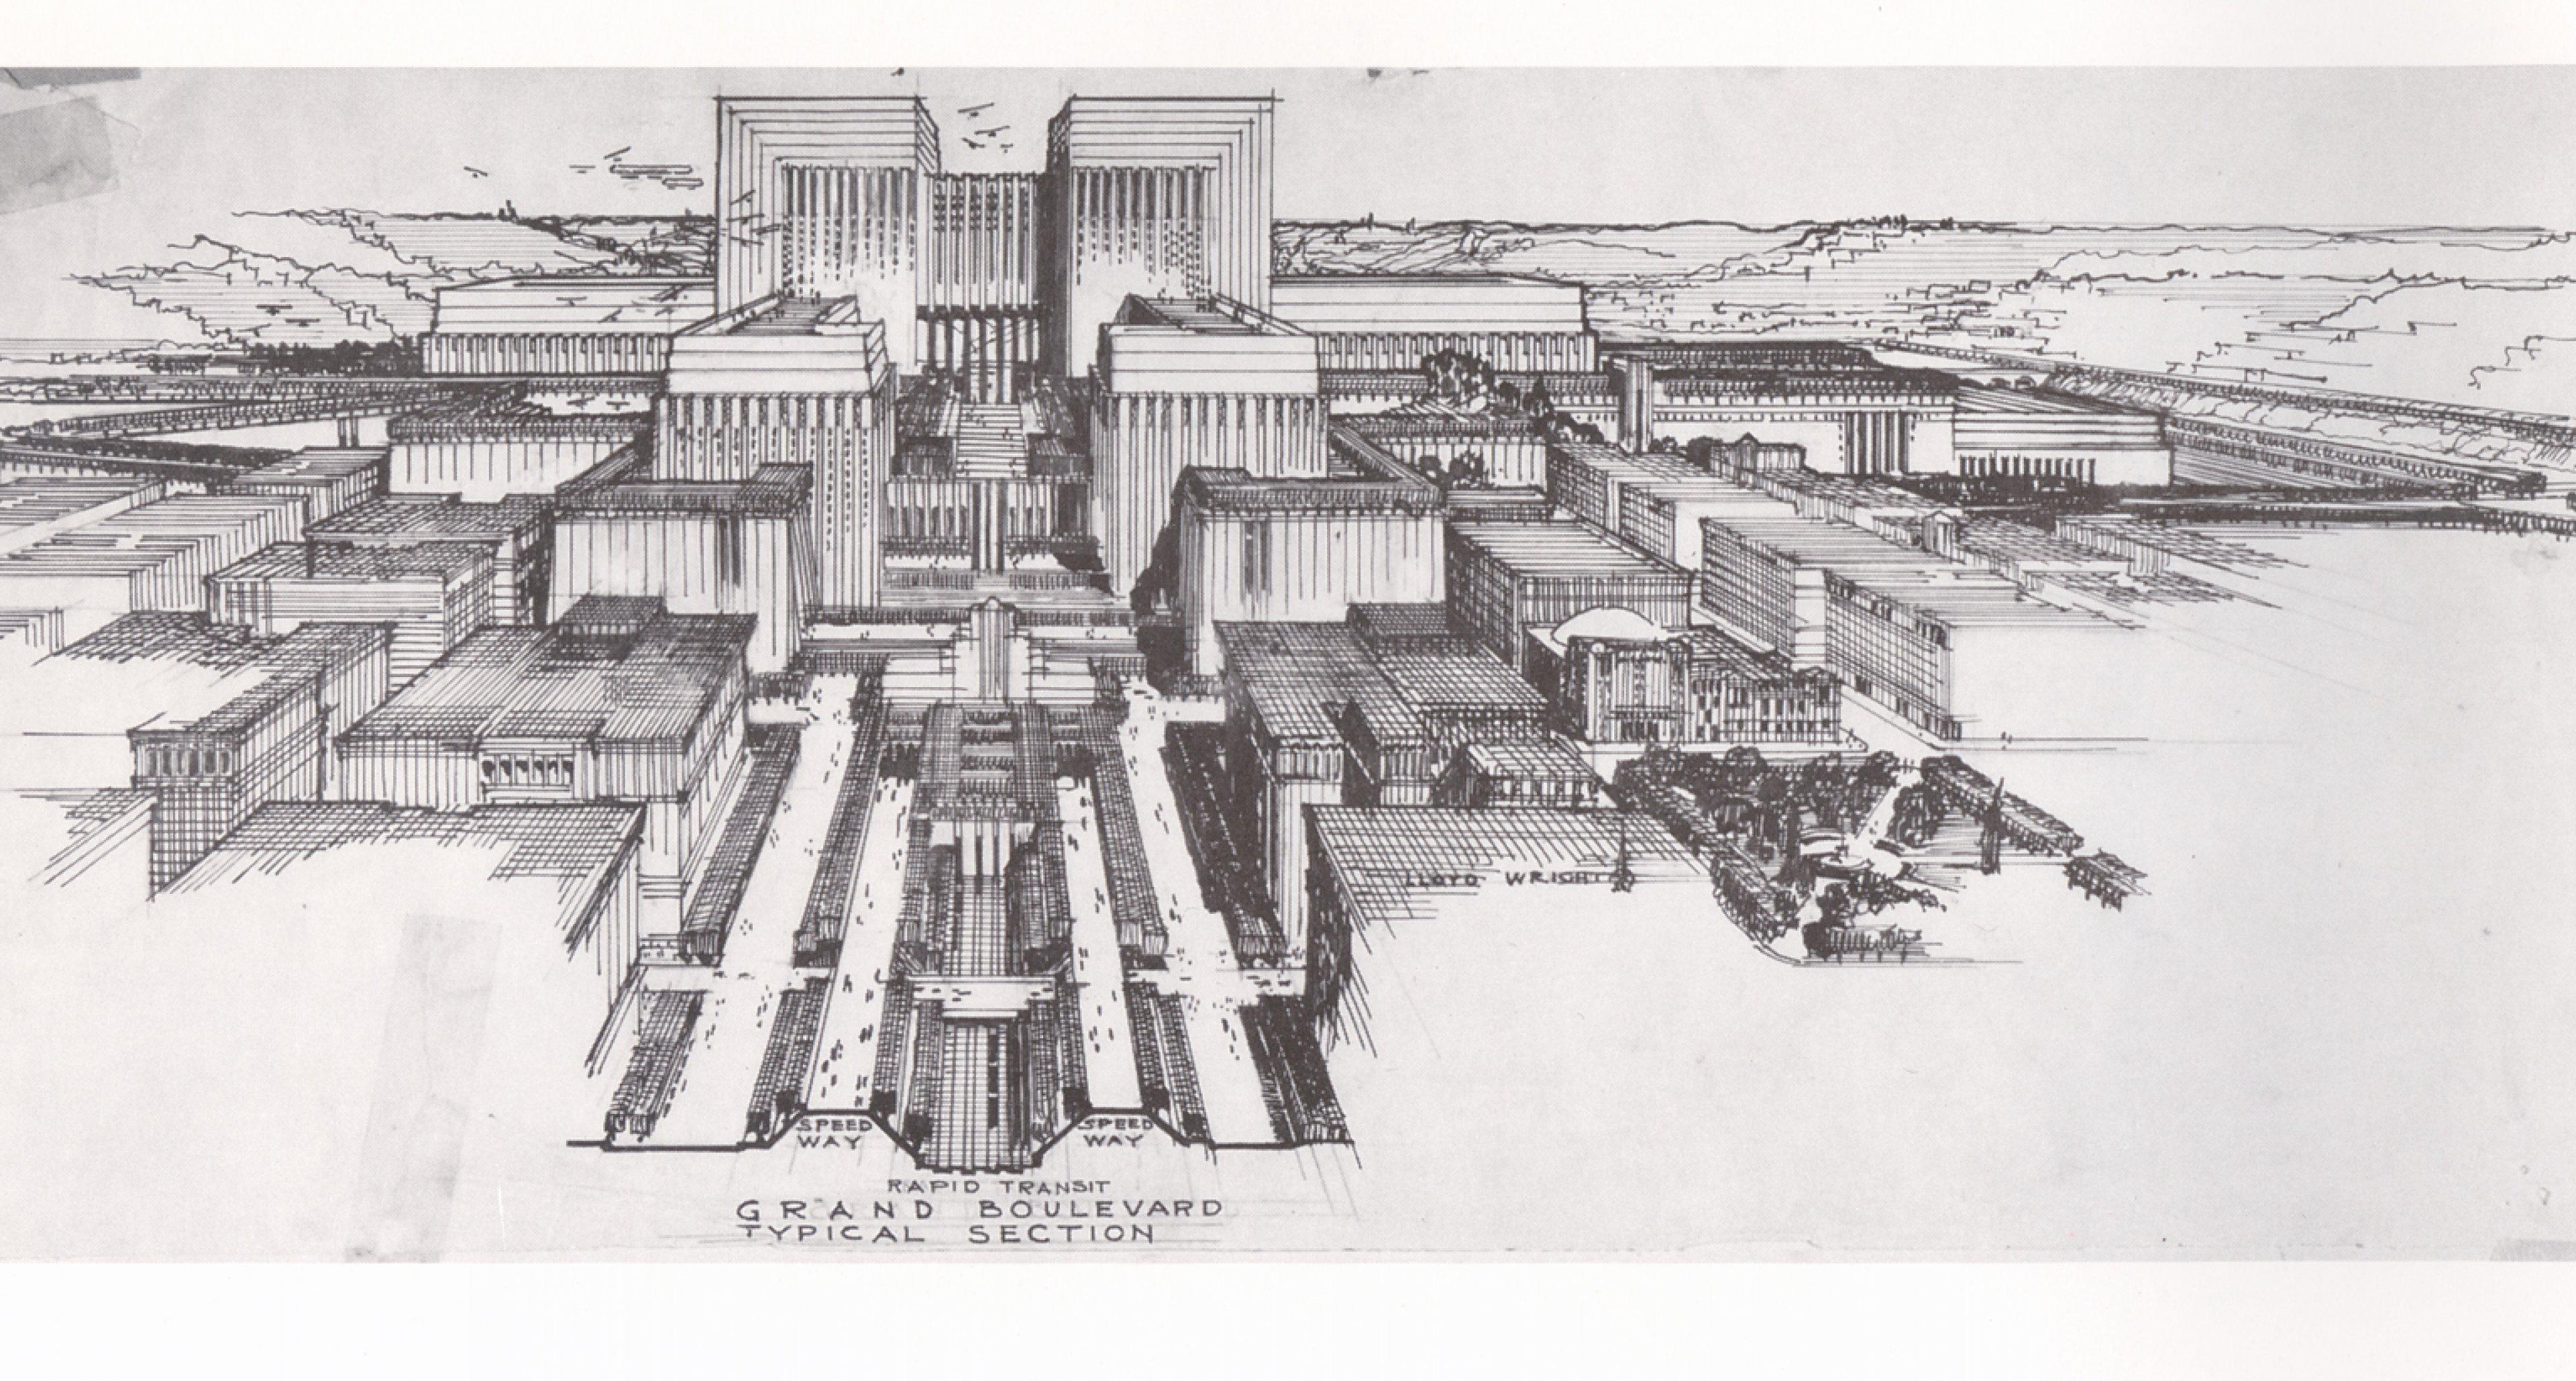 Lloyd Wright Civic Center Plan 1925 (Courtesy Eric Lloyd).